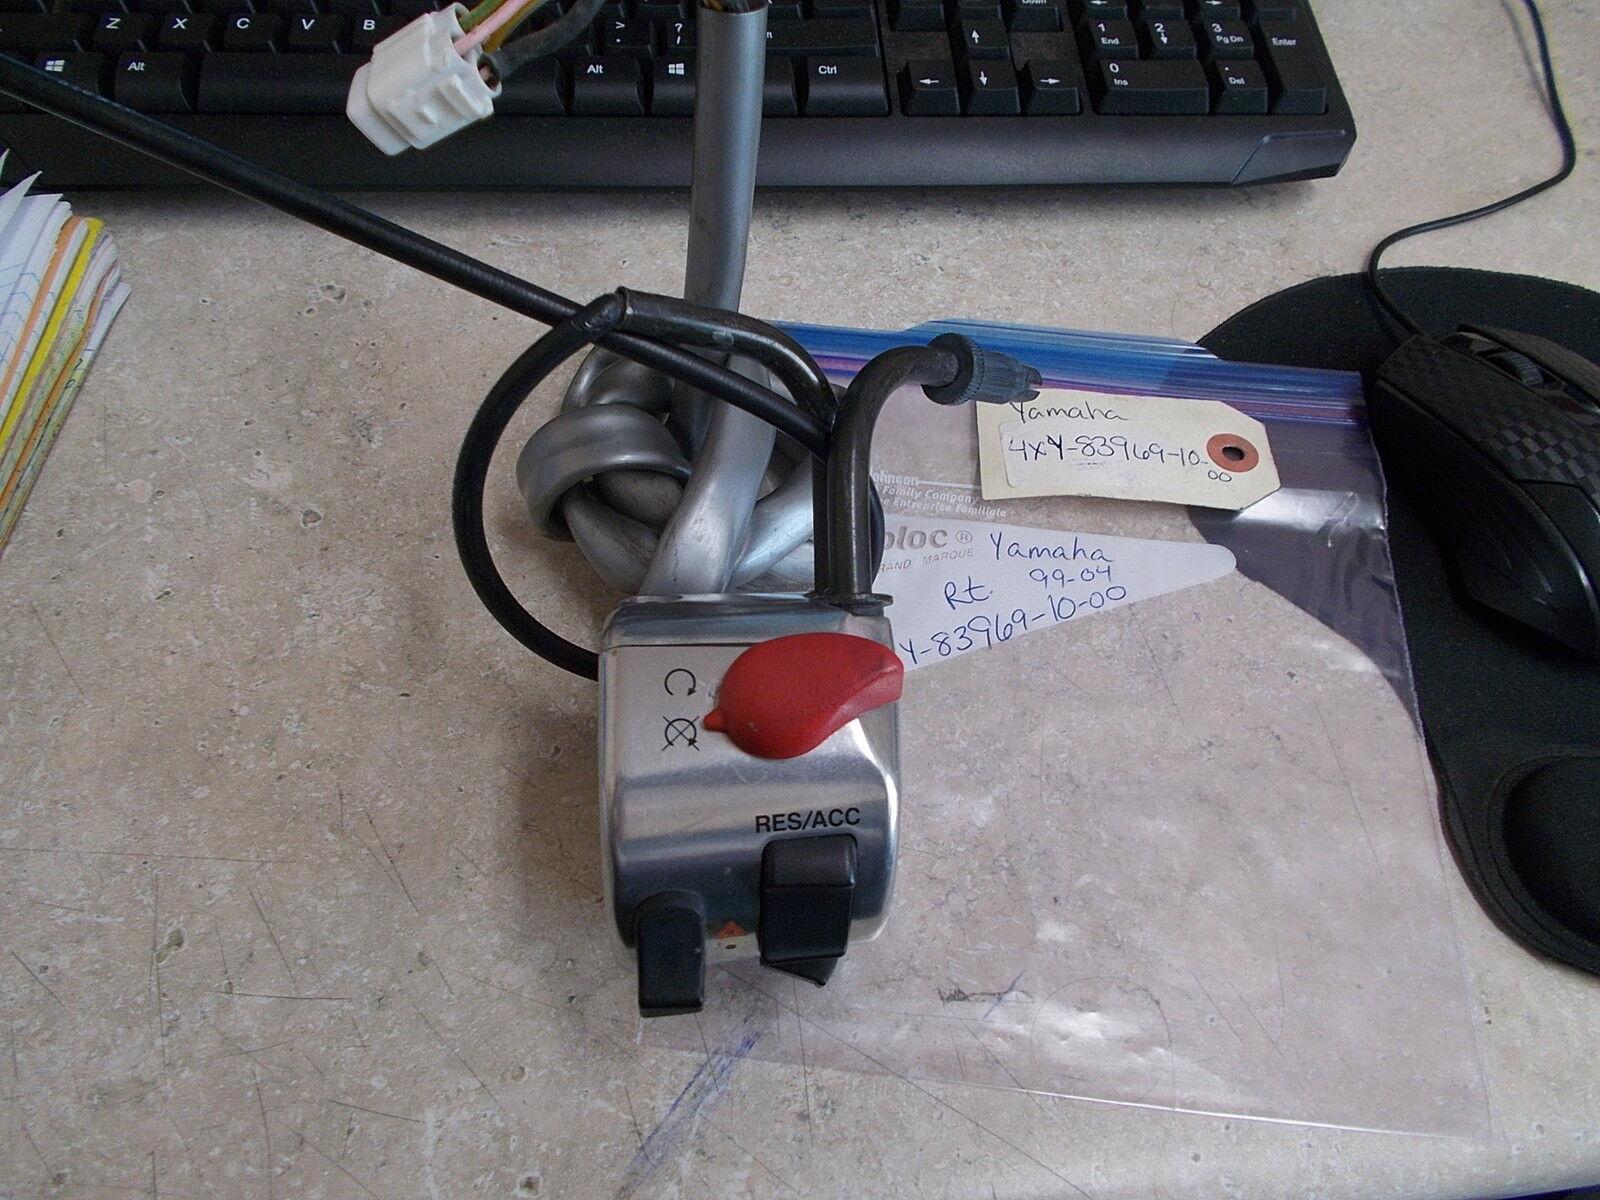 Oem Yamaha Lenker Schalter Rechts 5 1999-2004 Xvz13 Xvz1300 4xy-83969-10-00     Komfort